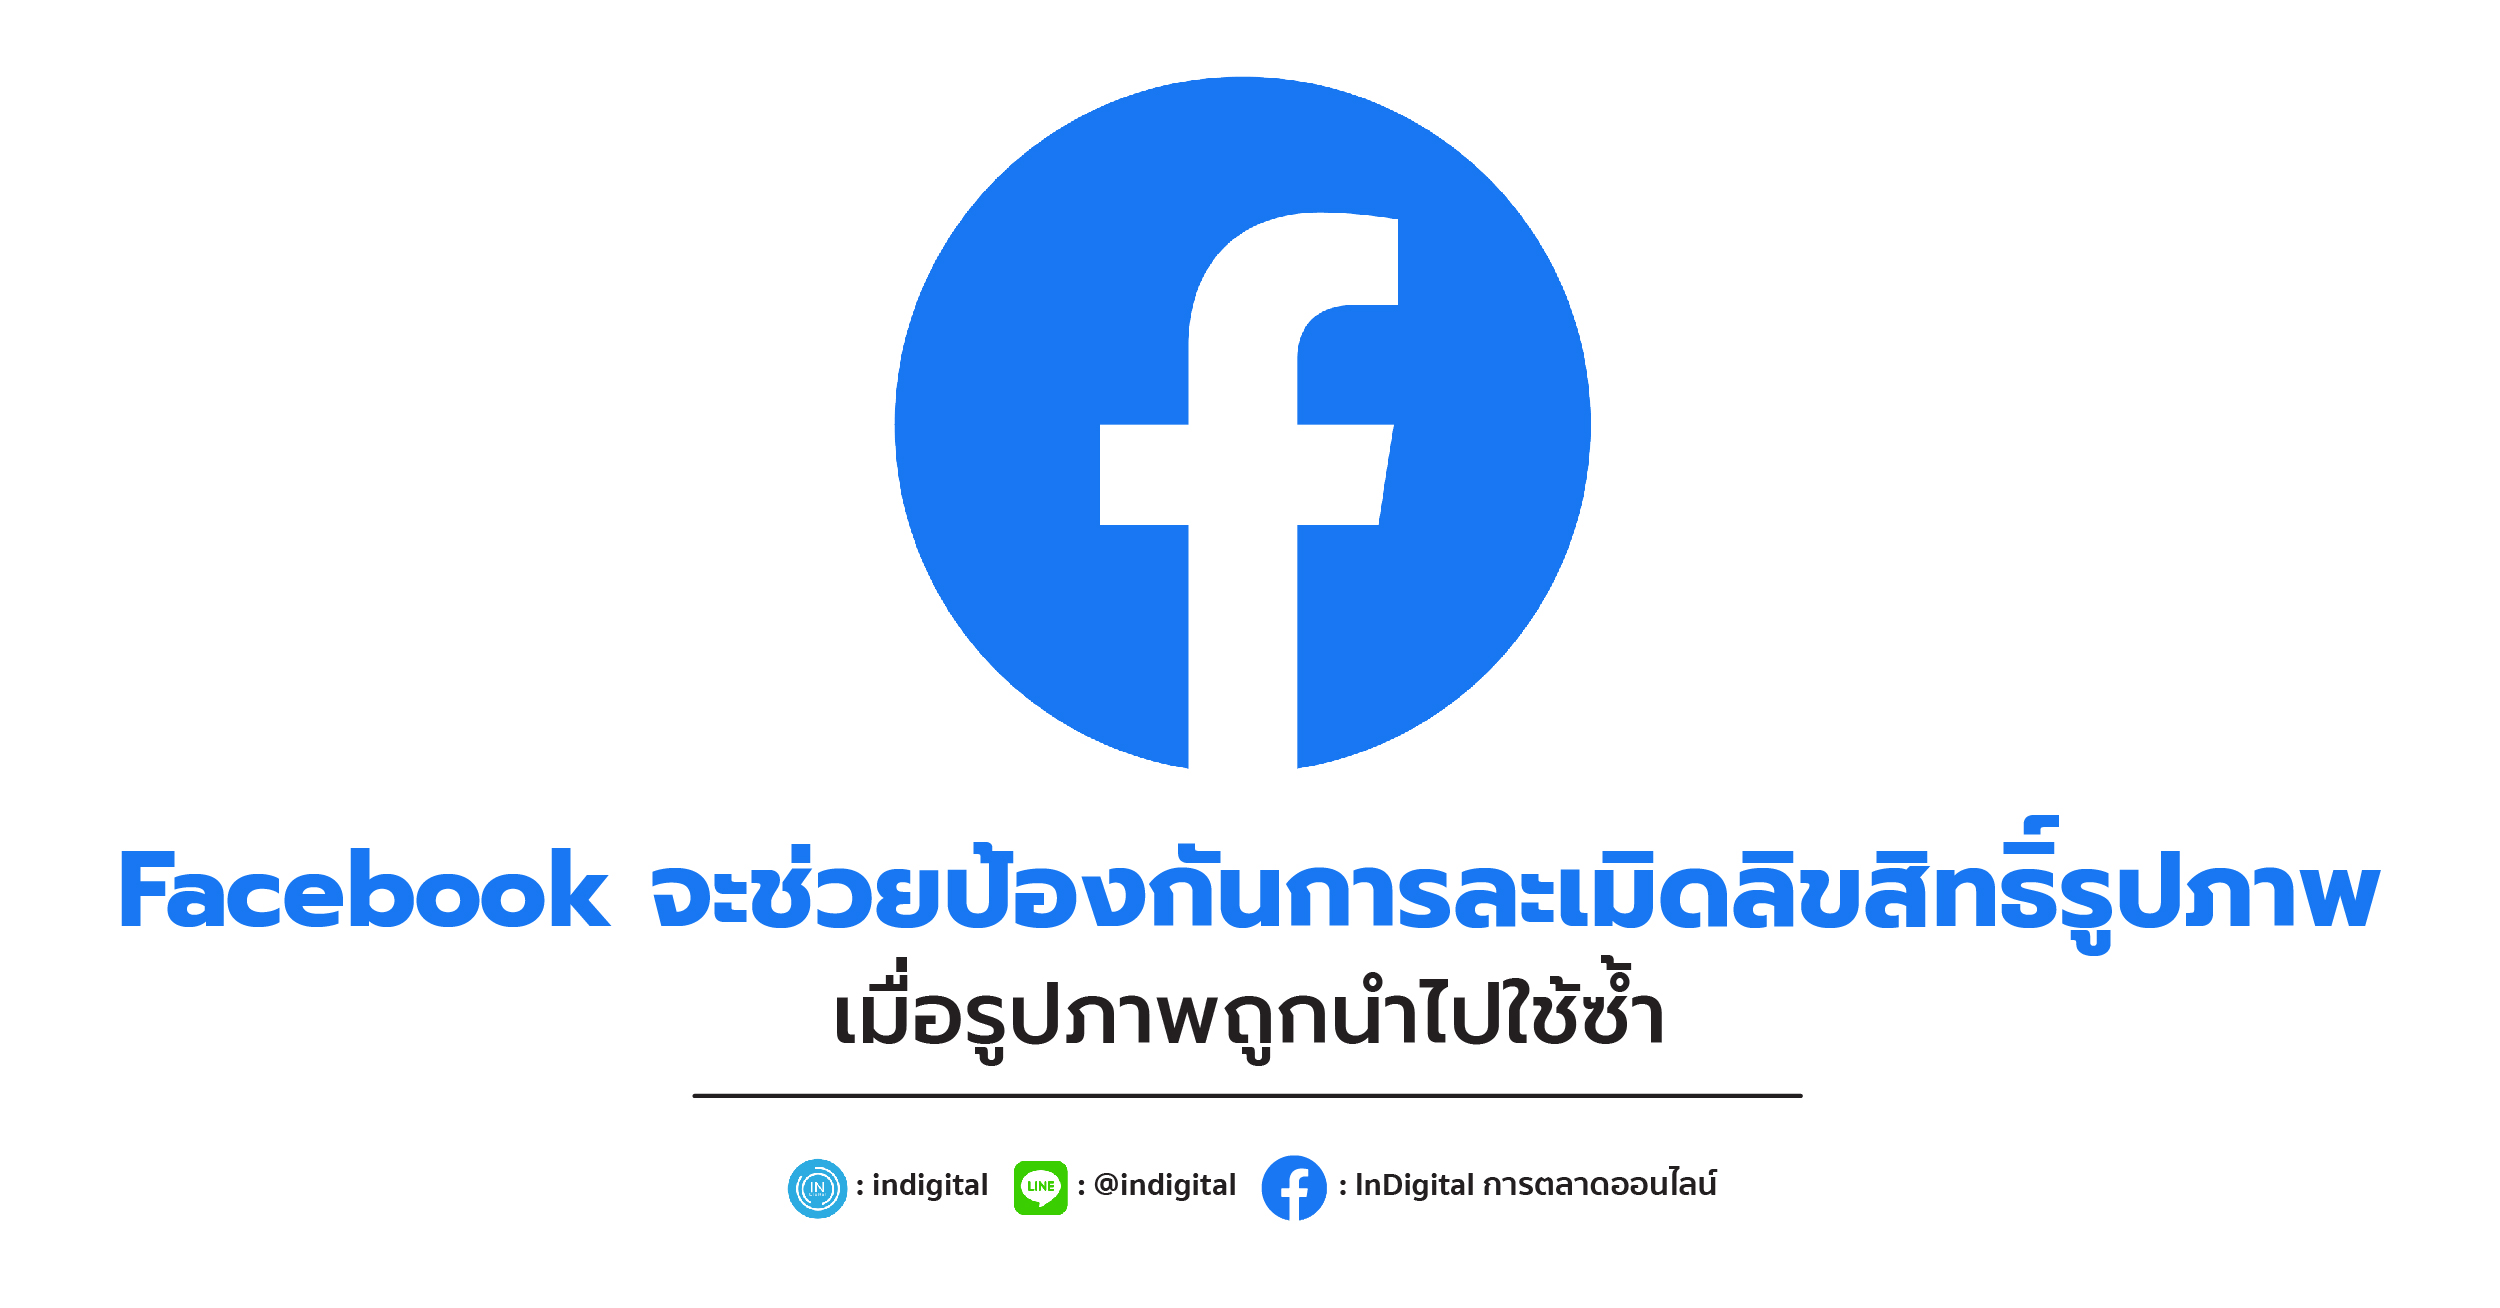 Facebook จะช่วยป้องกันการละเมิดลิขสิทธิ์รูปภาพ เมื่อรูปภาพถูกนำไปใช้ซ้ำ